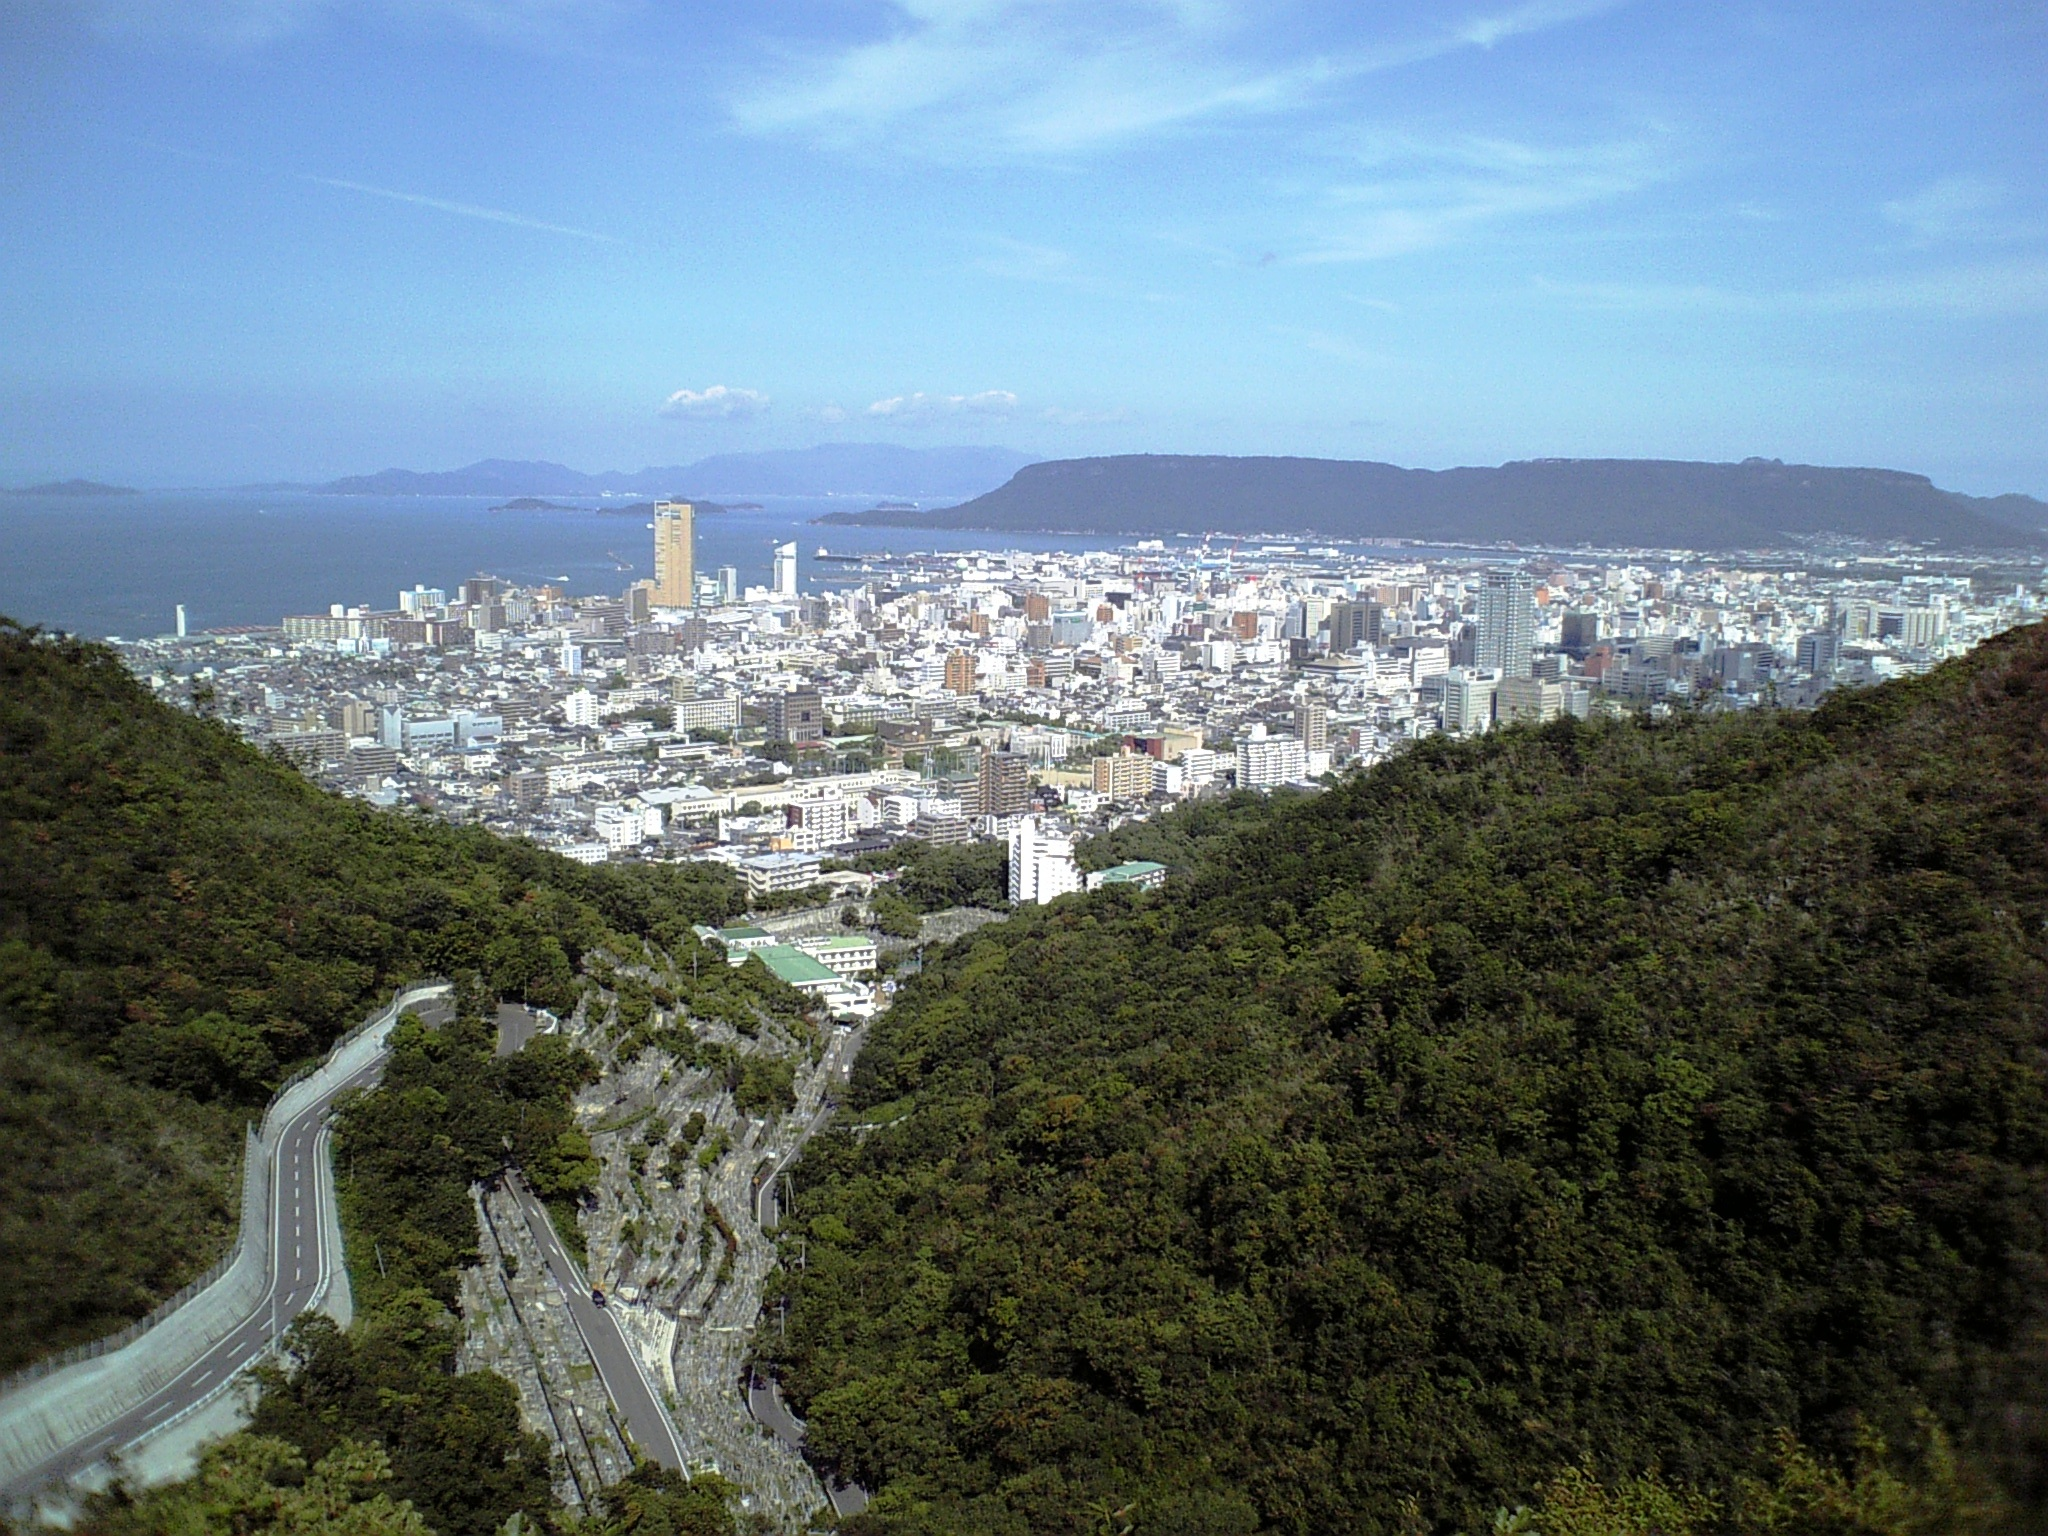 Takamatsu Japan  city photos gallery : Takamatsu from Mineyama Wikimedia Commons